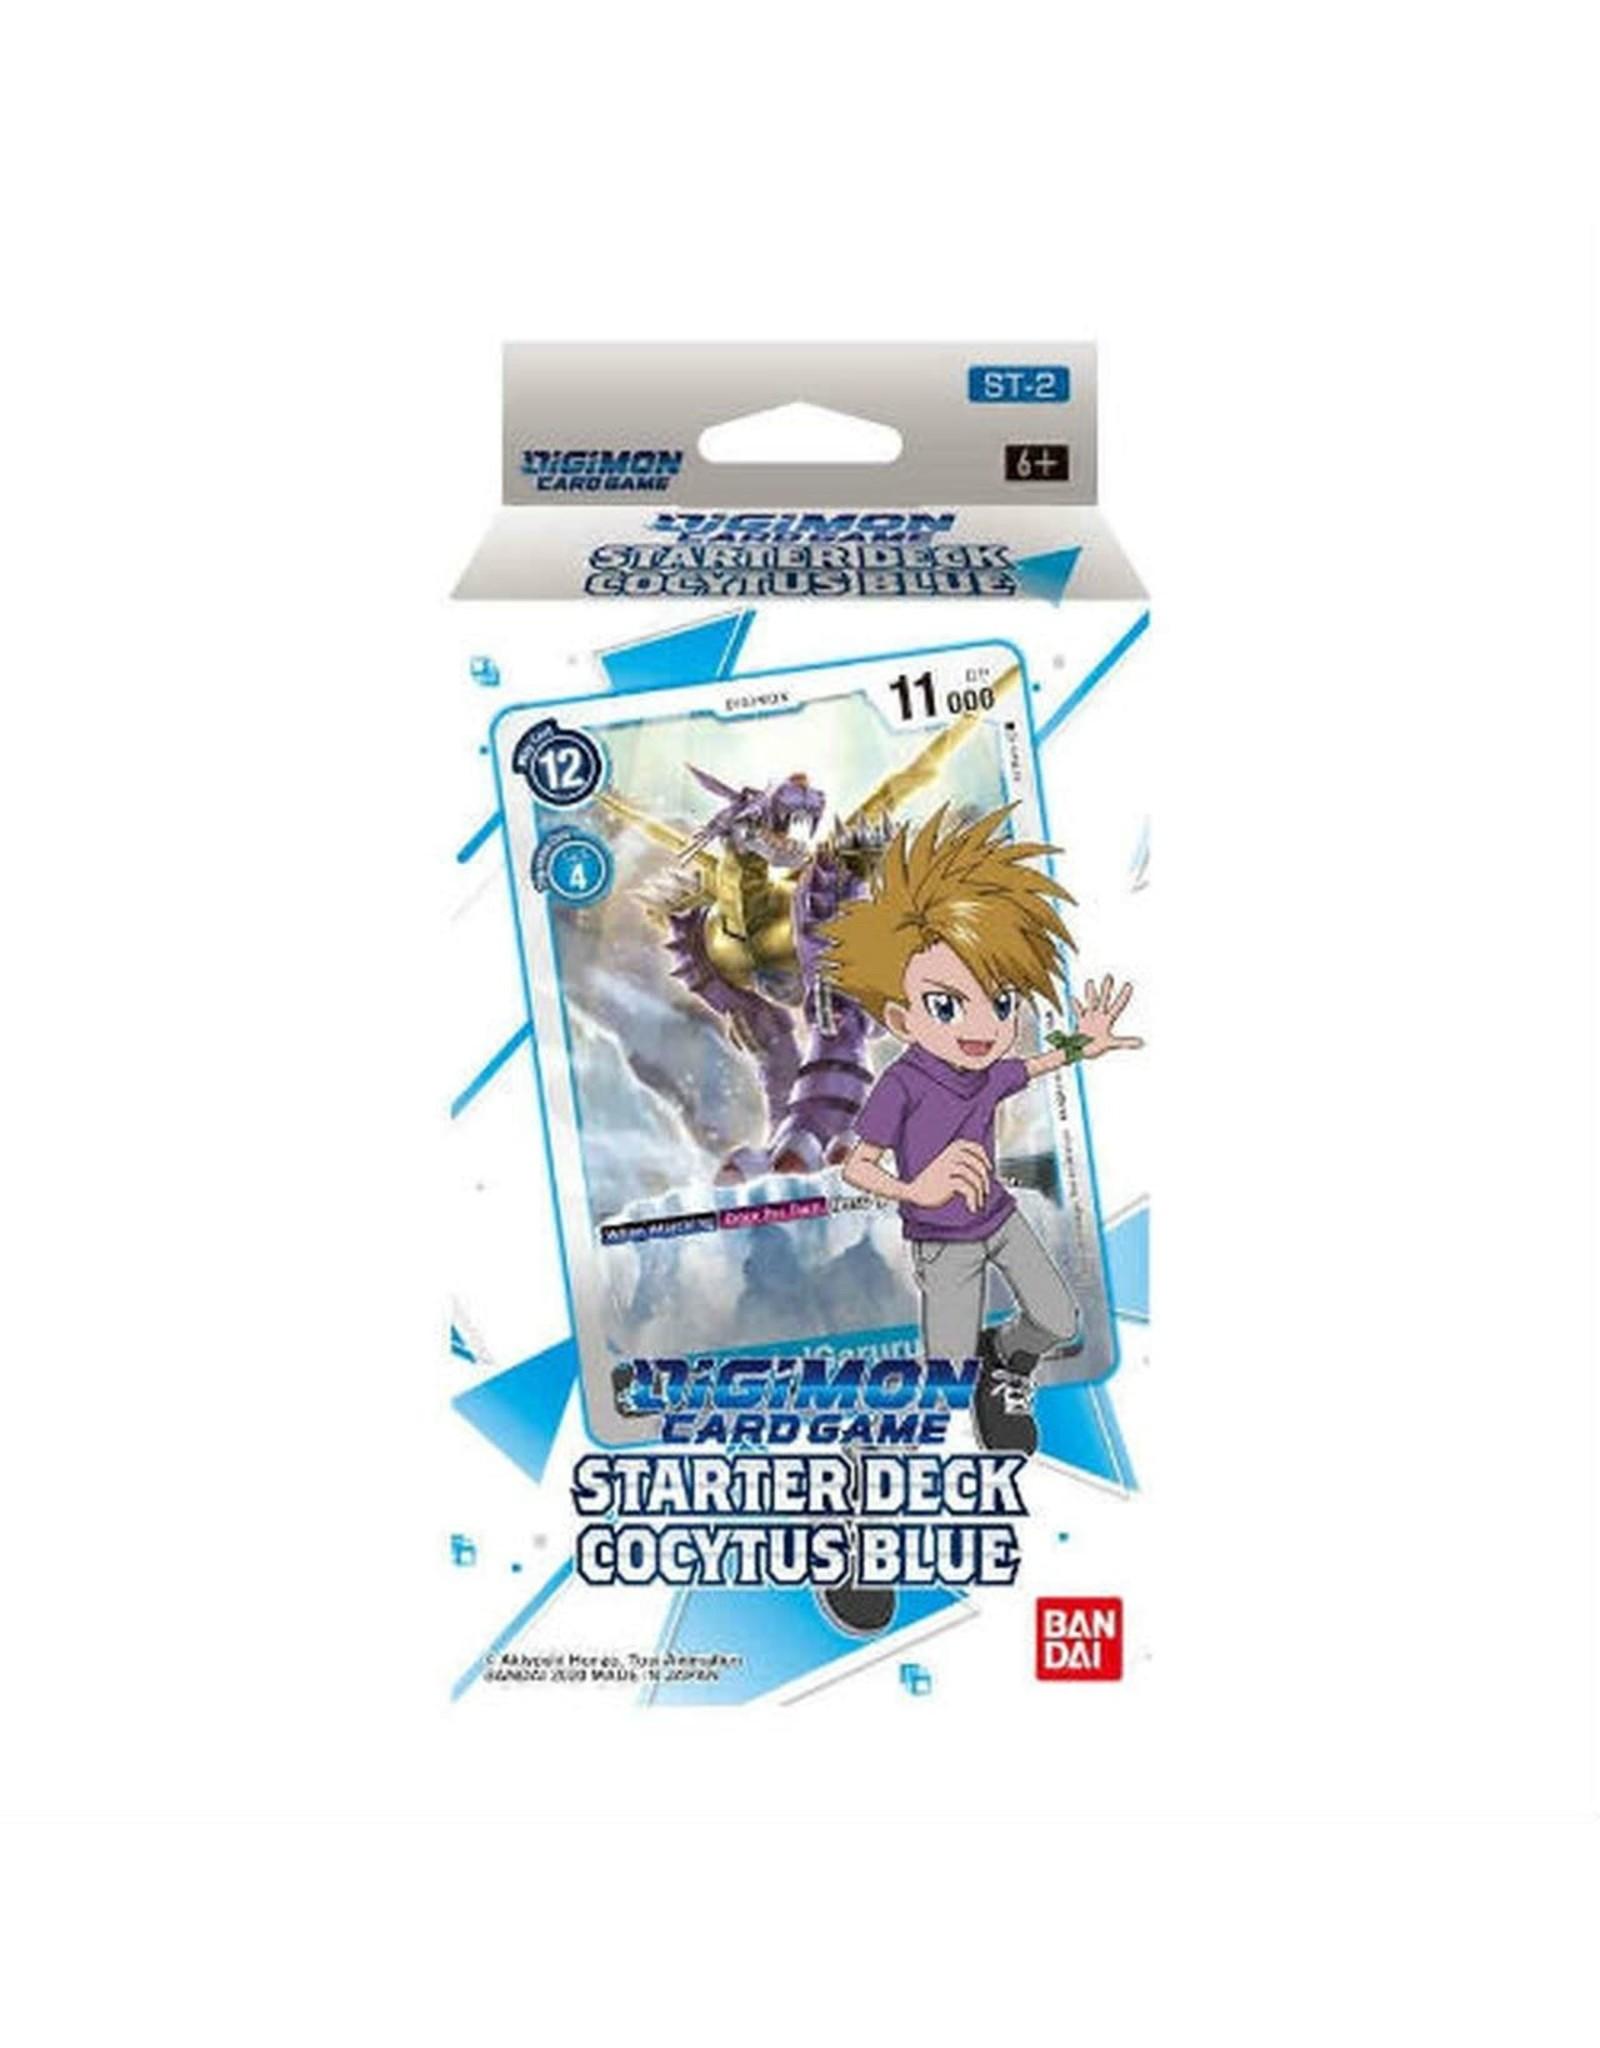 Bandai Digimon TCG: Starter Deck - Cocytus Blue